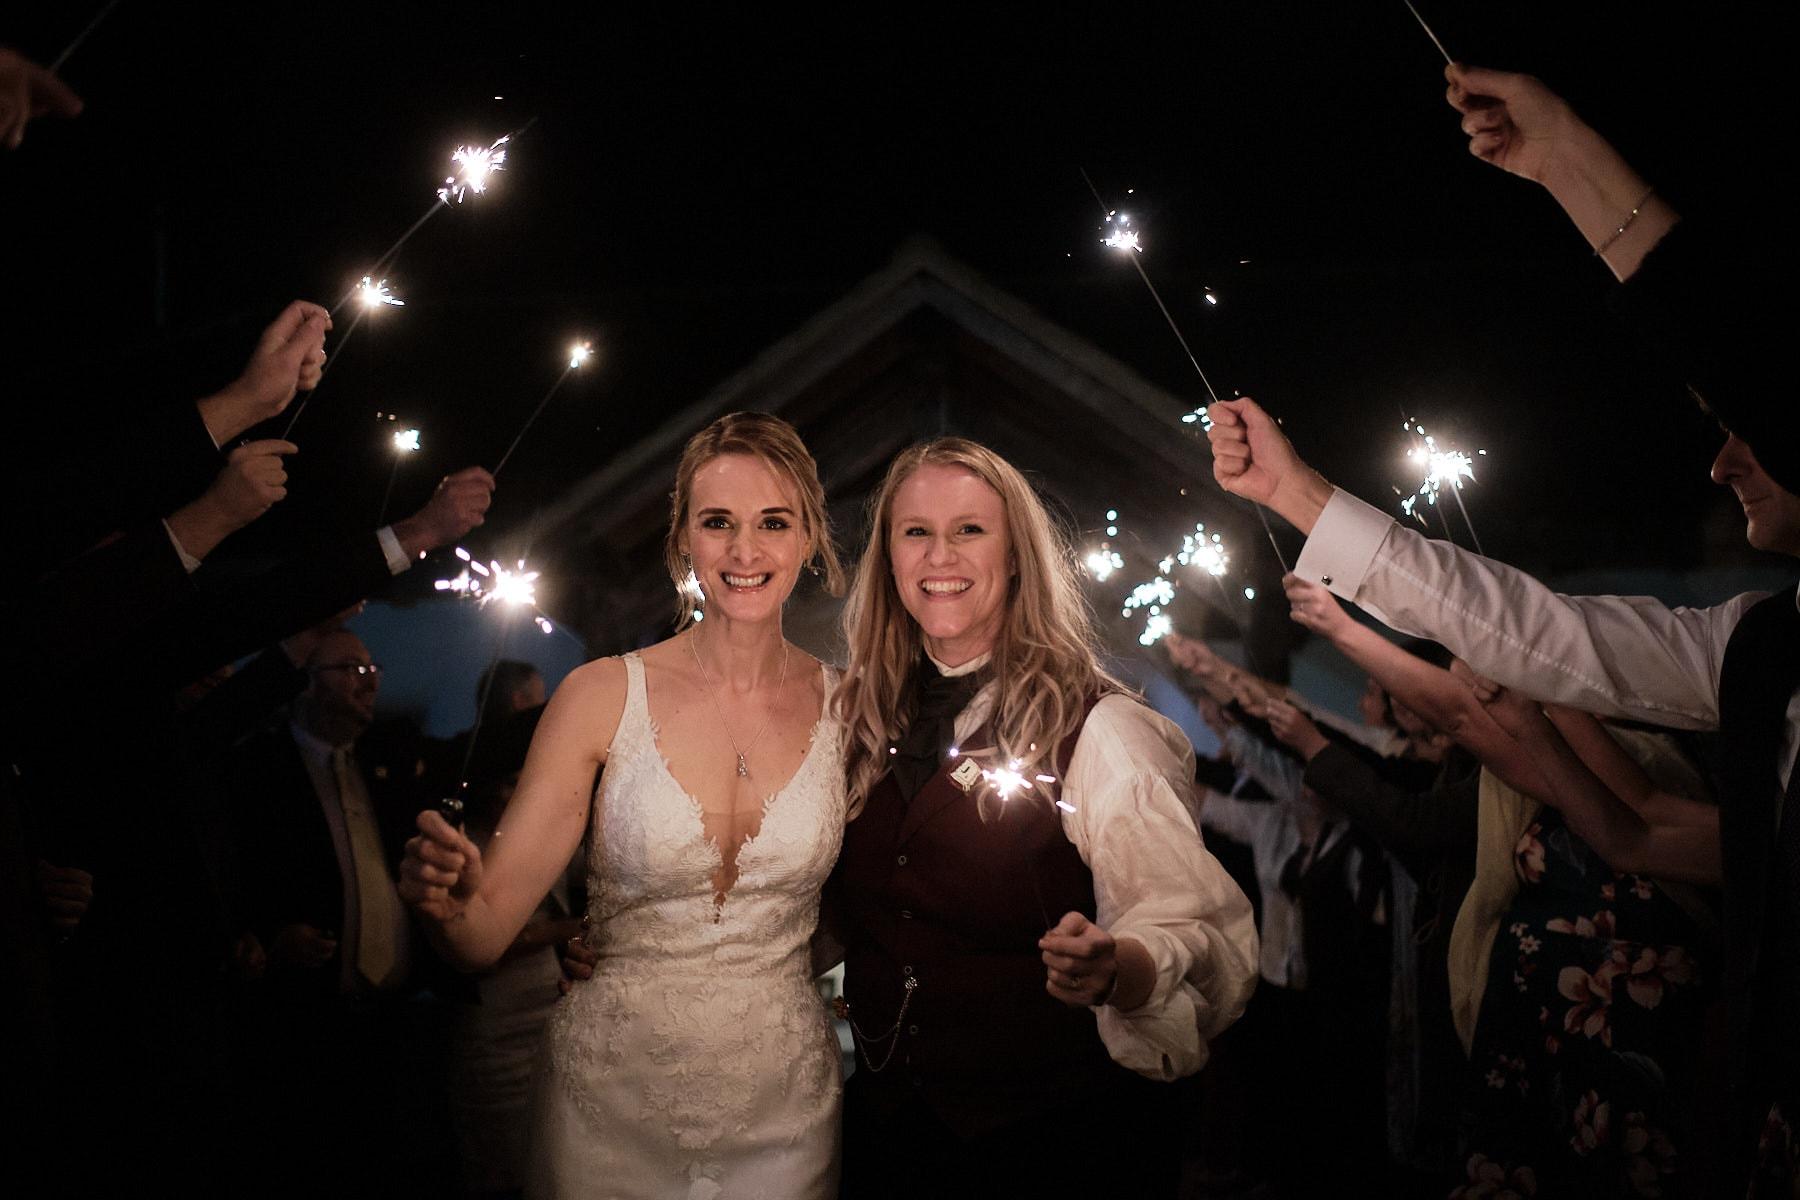 A couple walk through a procession of fireworks on their wedding day in Woodhall Spa at Abbey Farm weddings